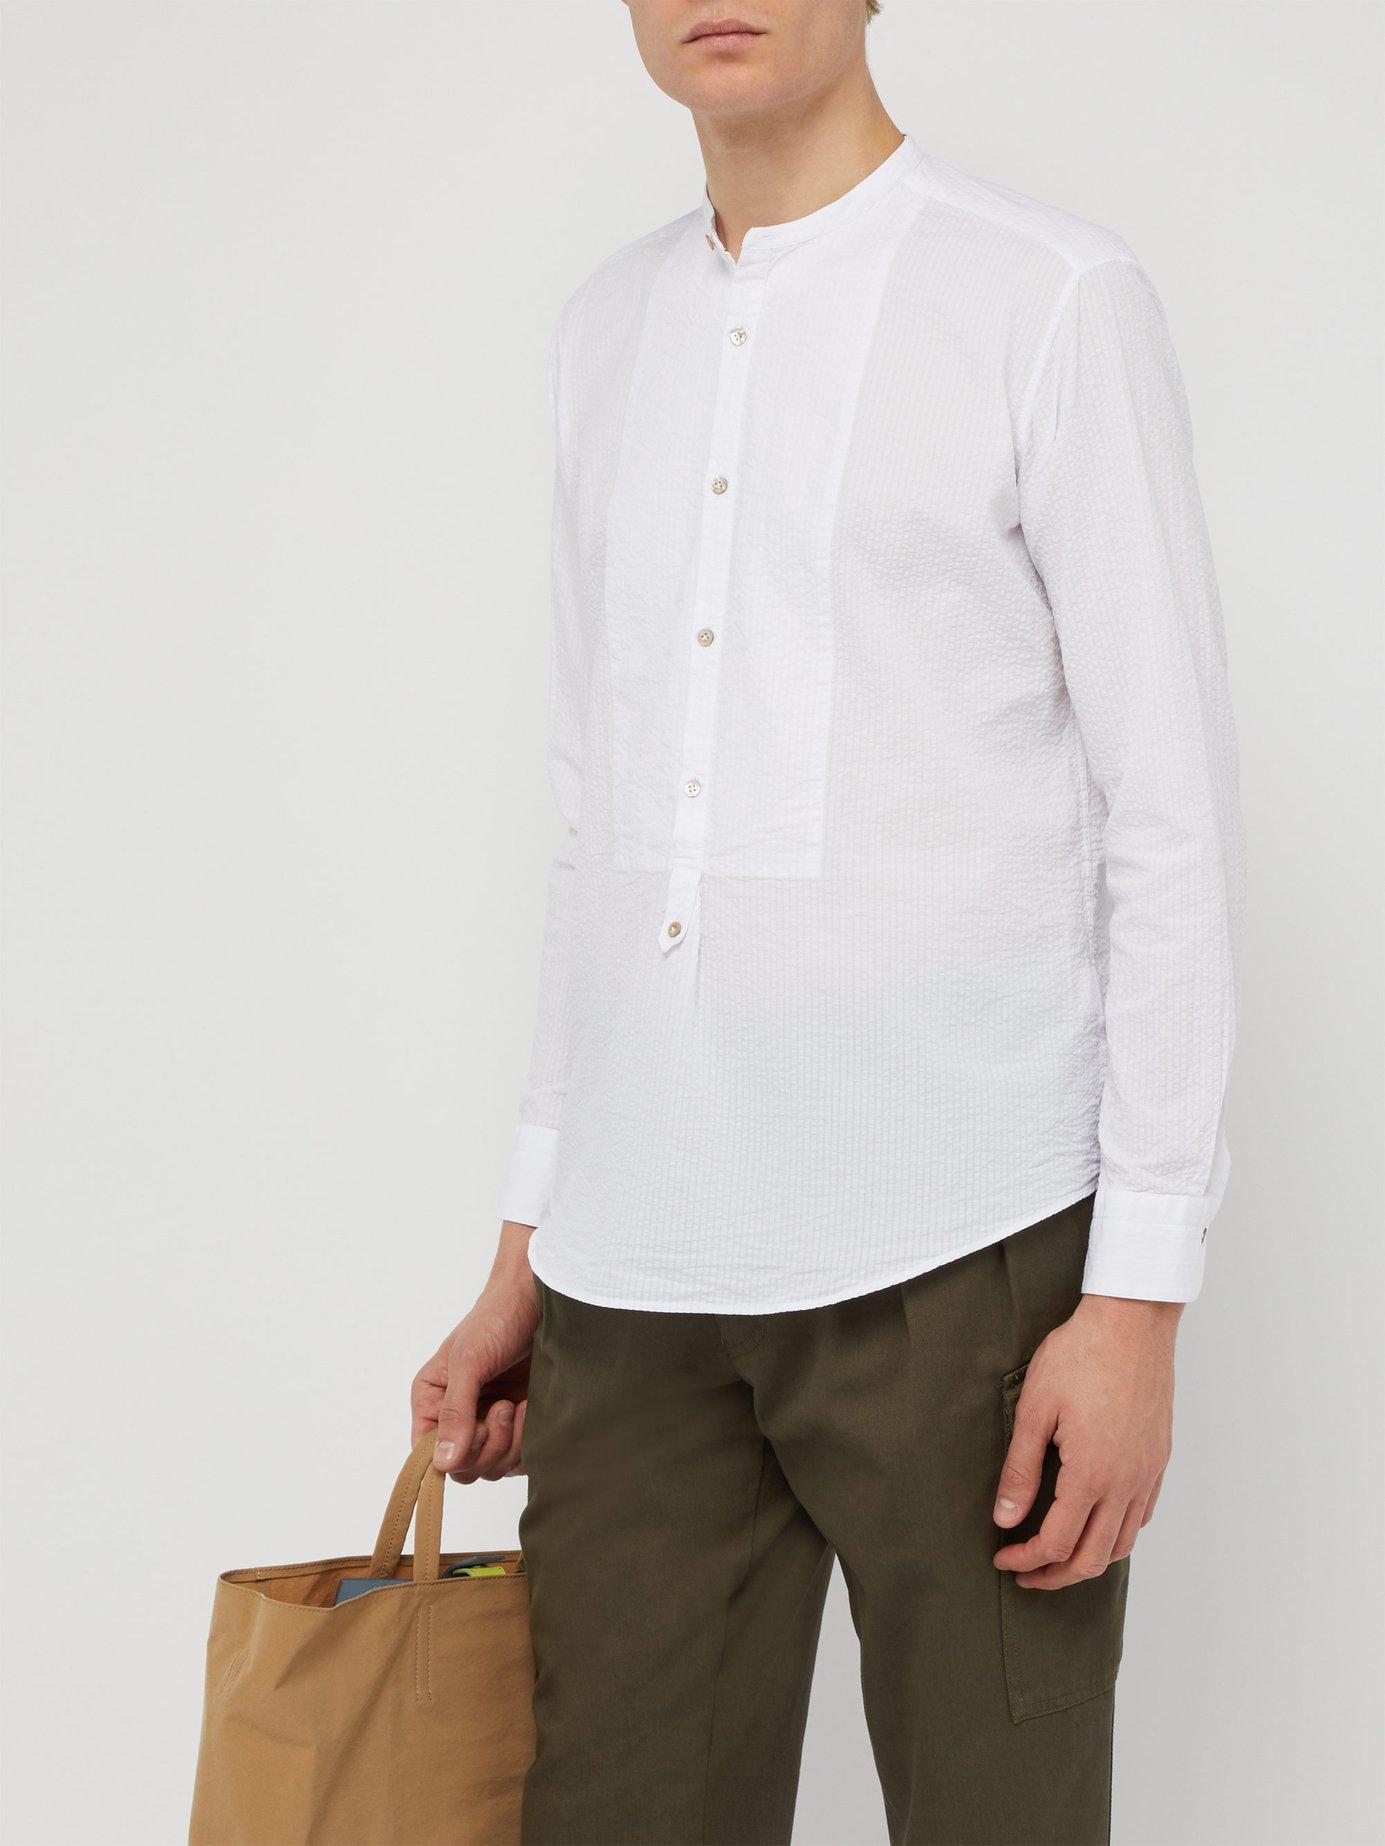 fdd52d19402882 Lyst - The Gigi Grandad Collar And Bib Cotton Seersucker Shirt in White for  Men - Save 60%